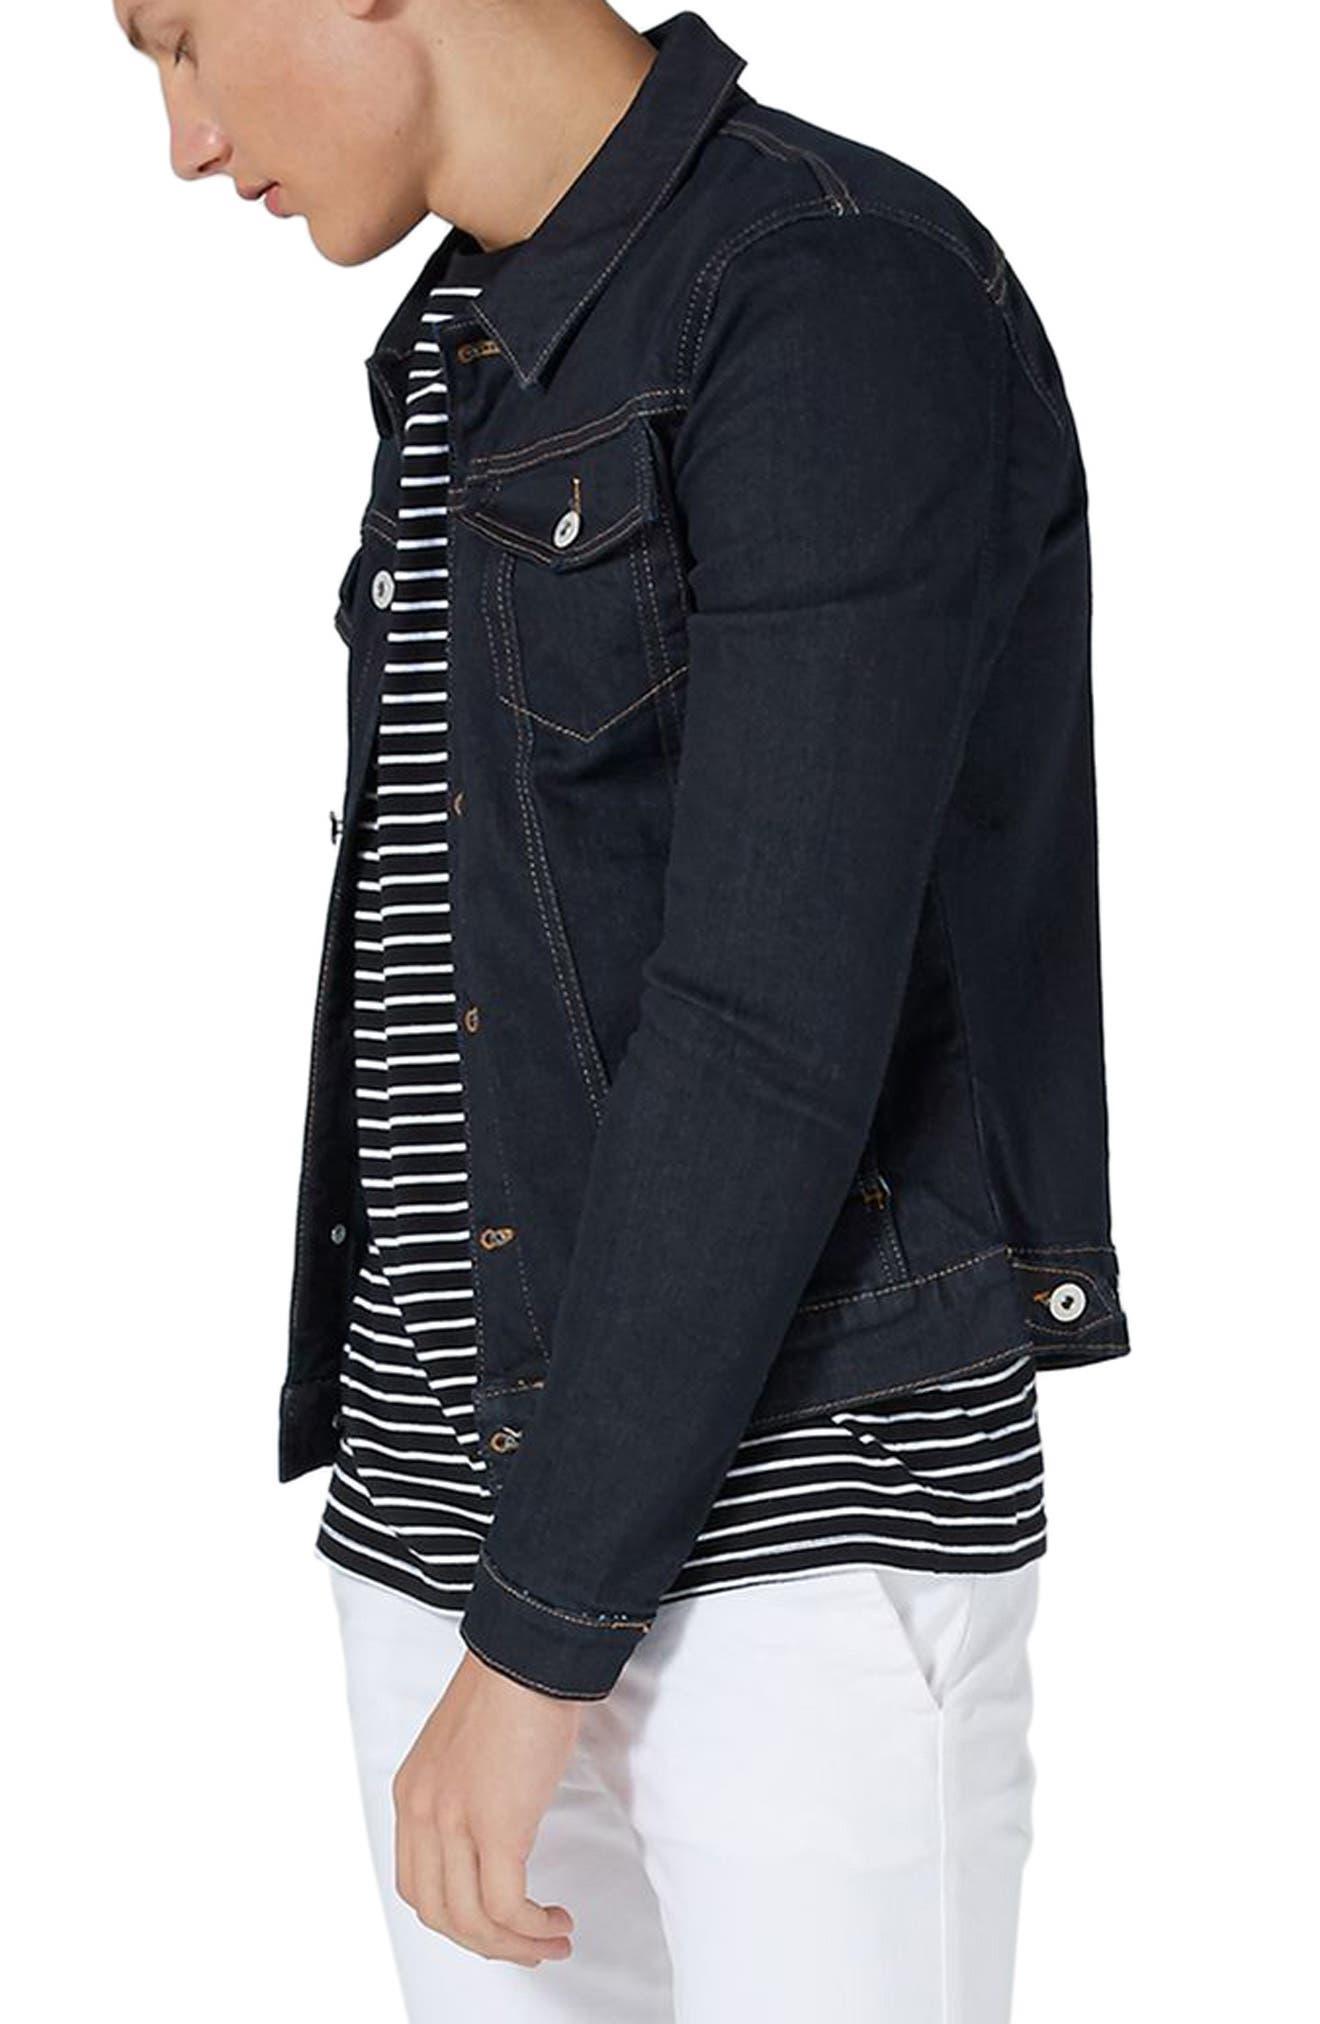 Main Image - Topman Raw Muscle Fit Denim Jacket